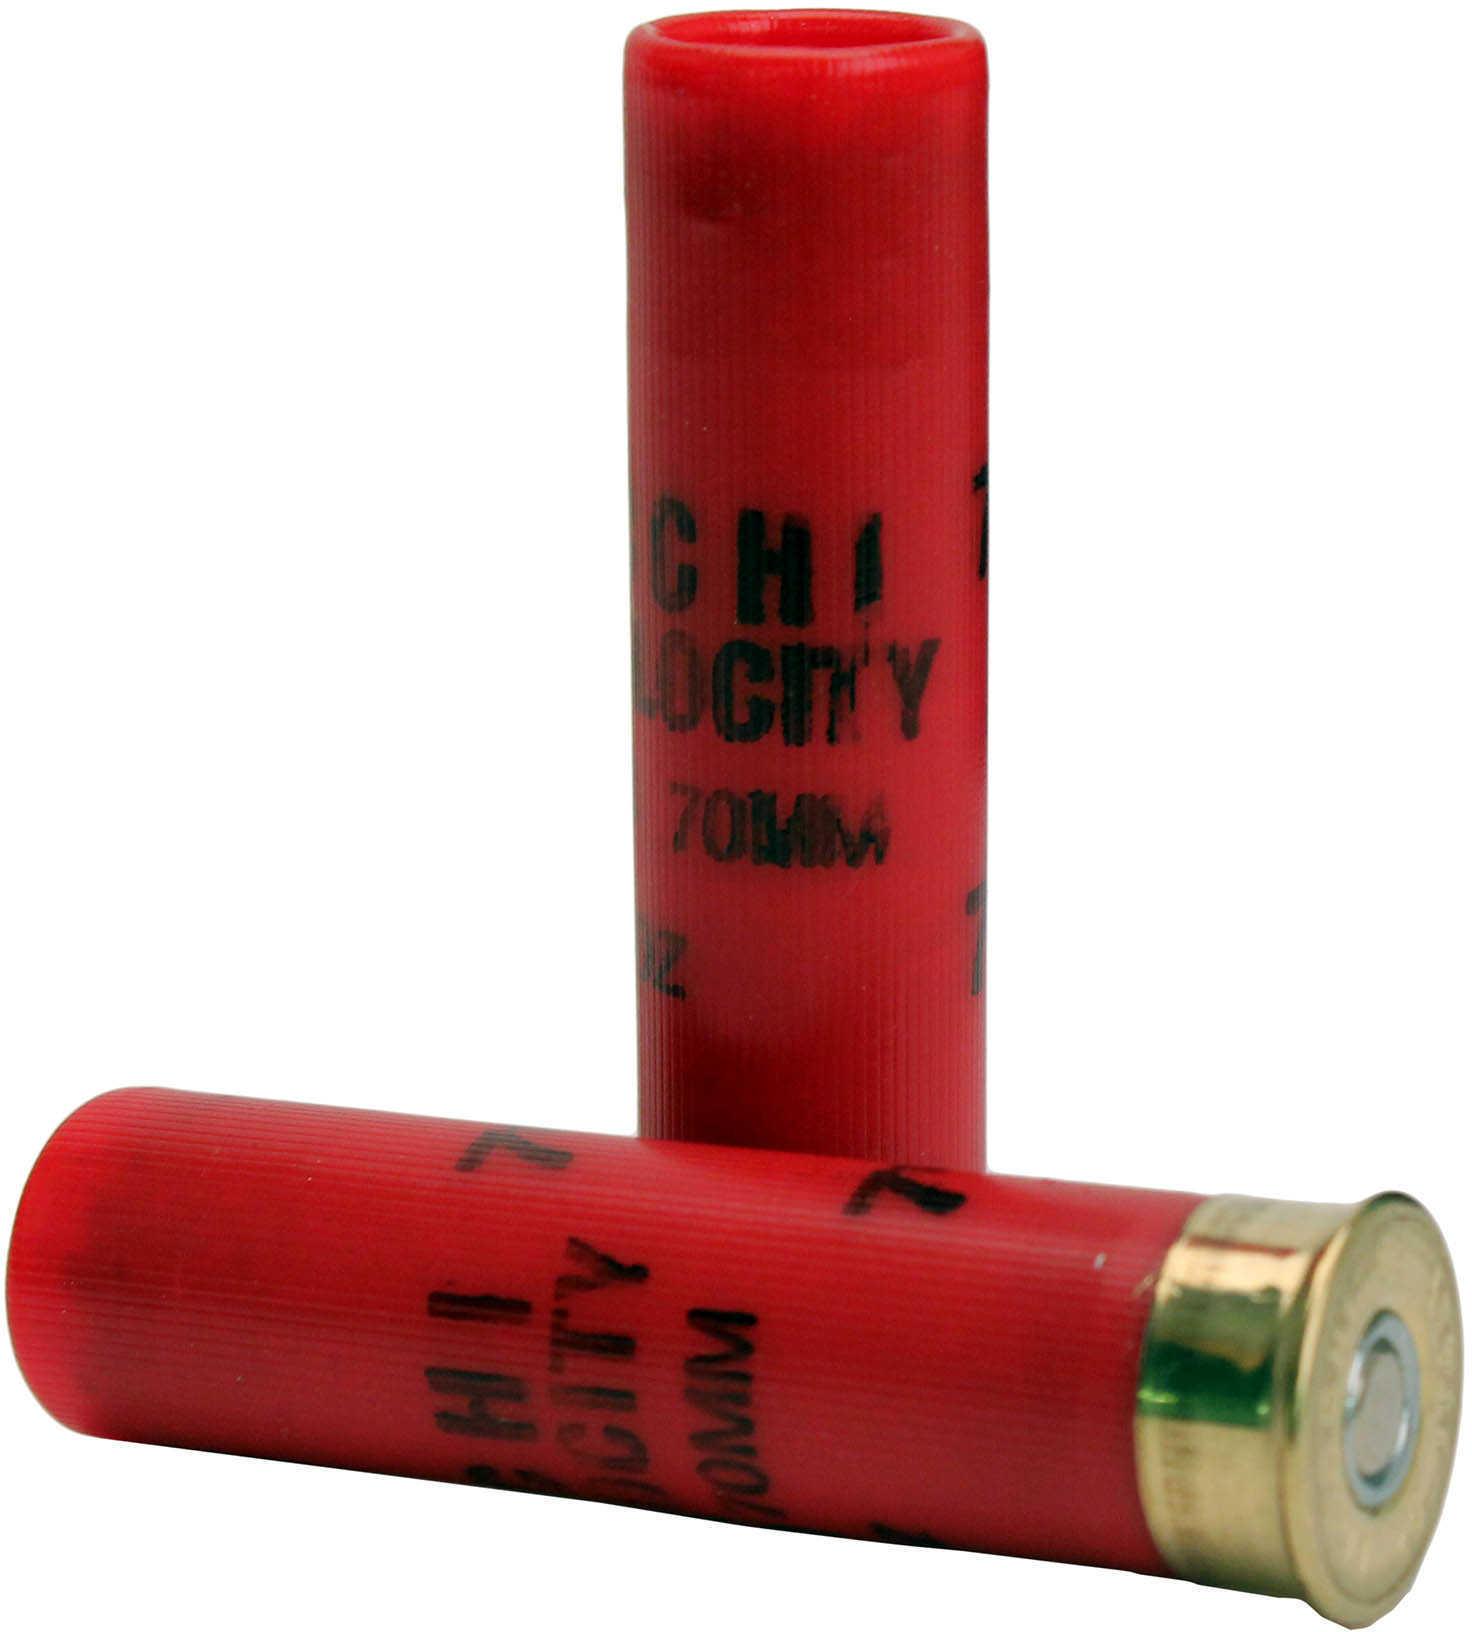 "Fiocchi 28HV75 Shooting Dynamics High Velocity 28 Gauge 2.75"" 3/4 Oz 7.5 Shot 25 Box"